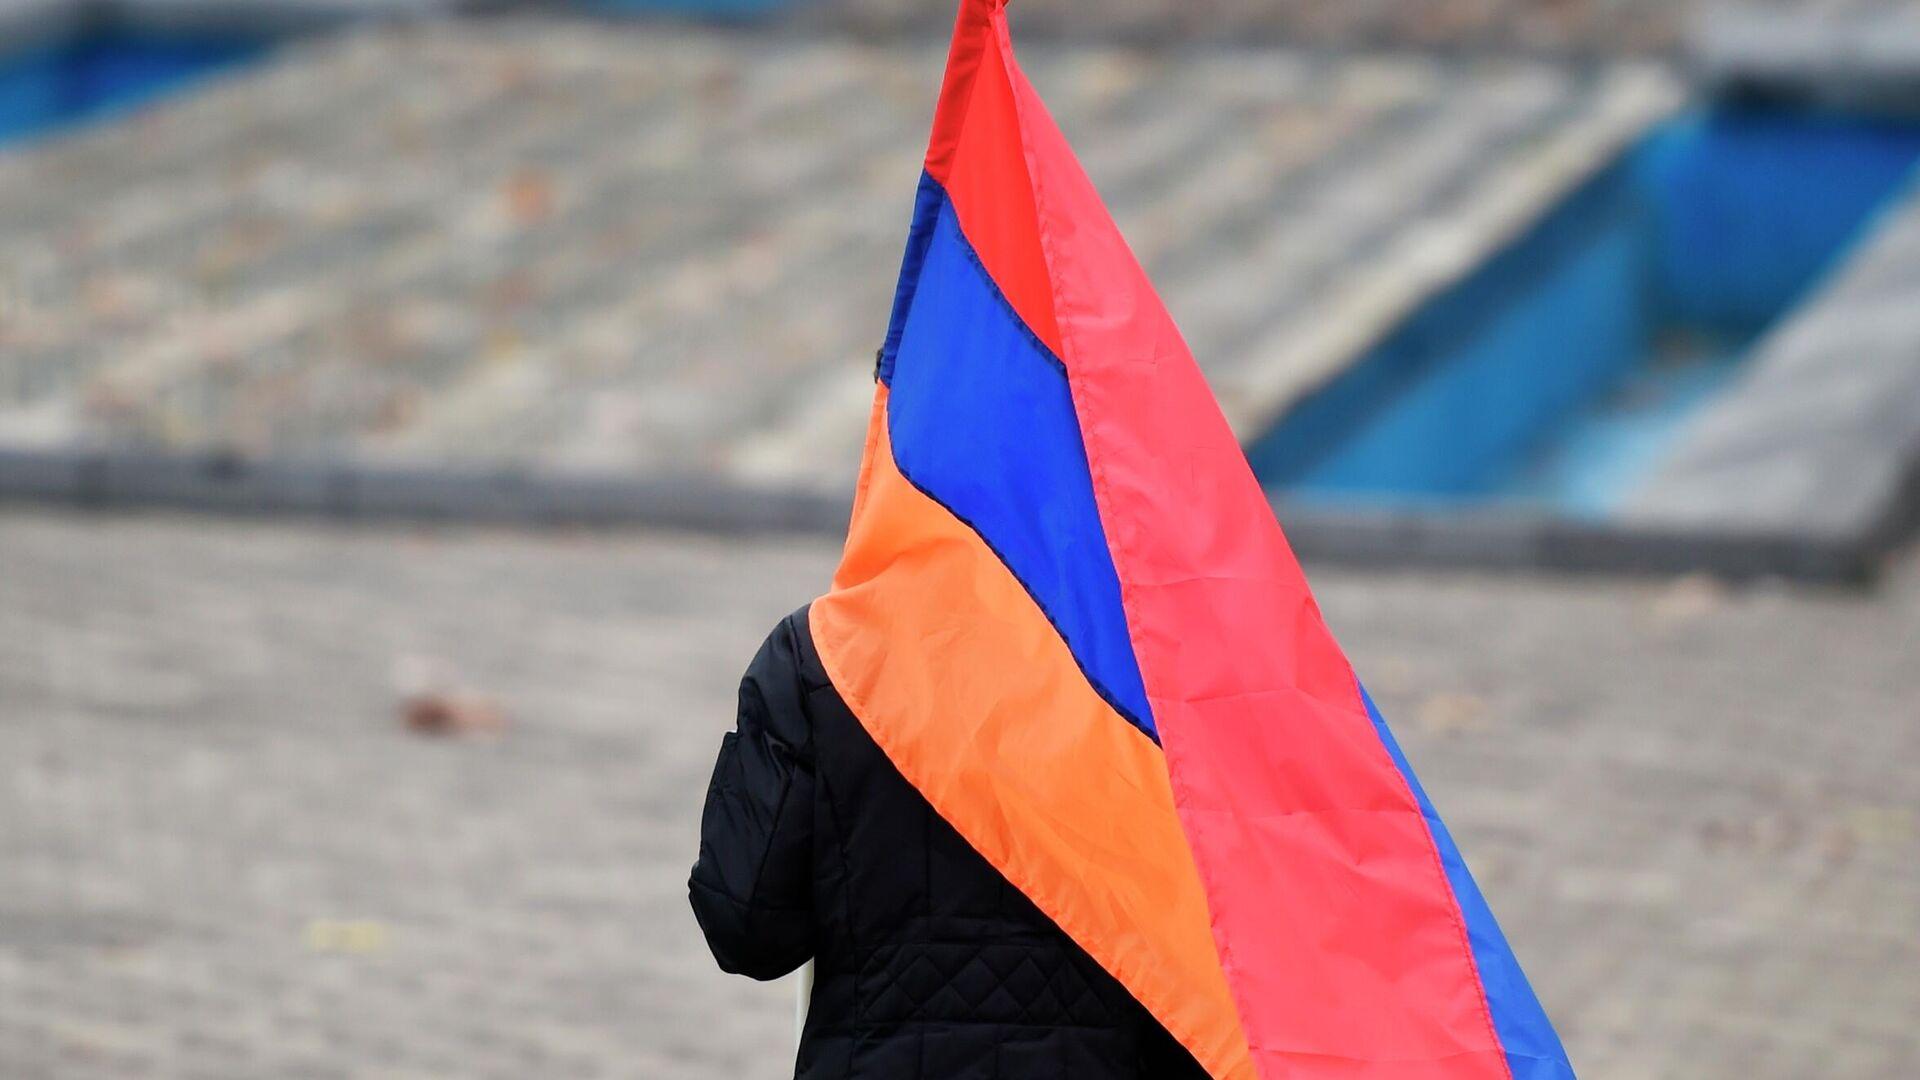 Сторонник оппозиции идет с флагом на митинг на площади Республики в Ереване - РИА Новости, 1920, 25.12.2020